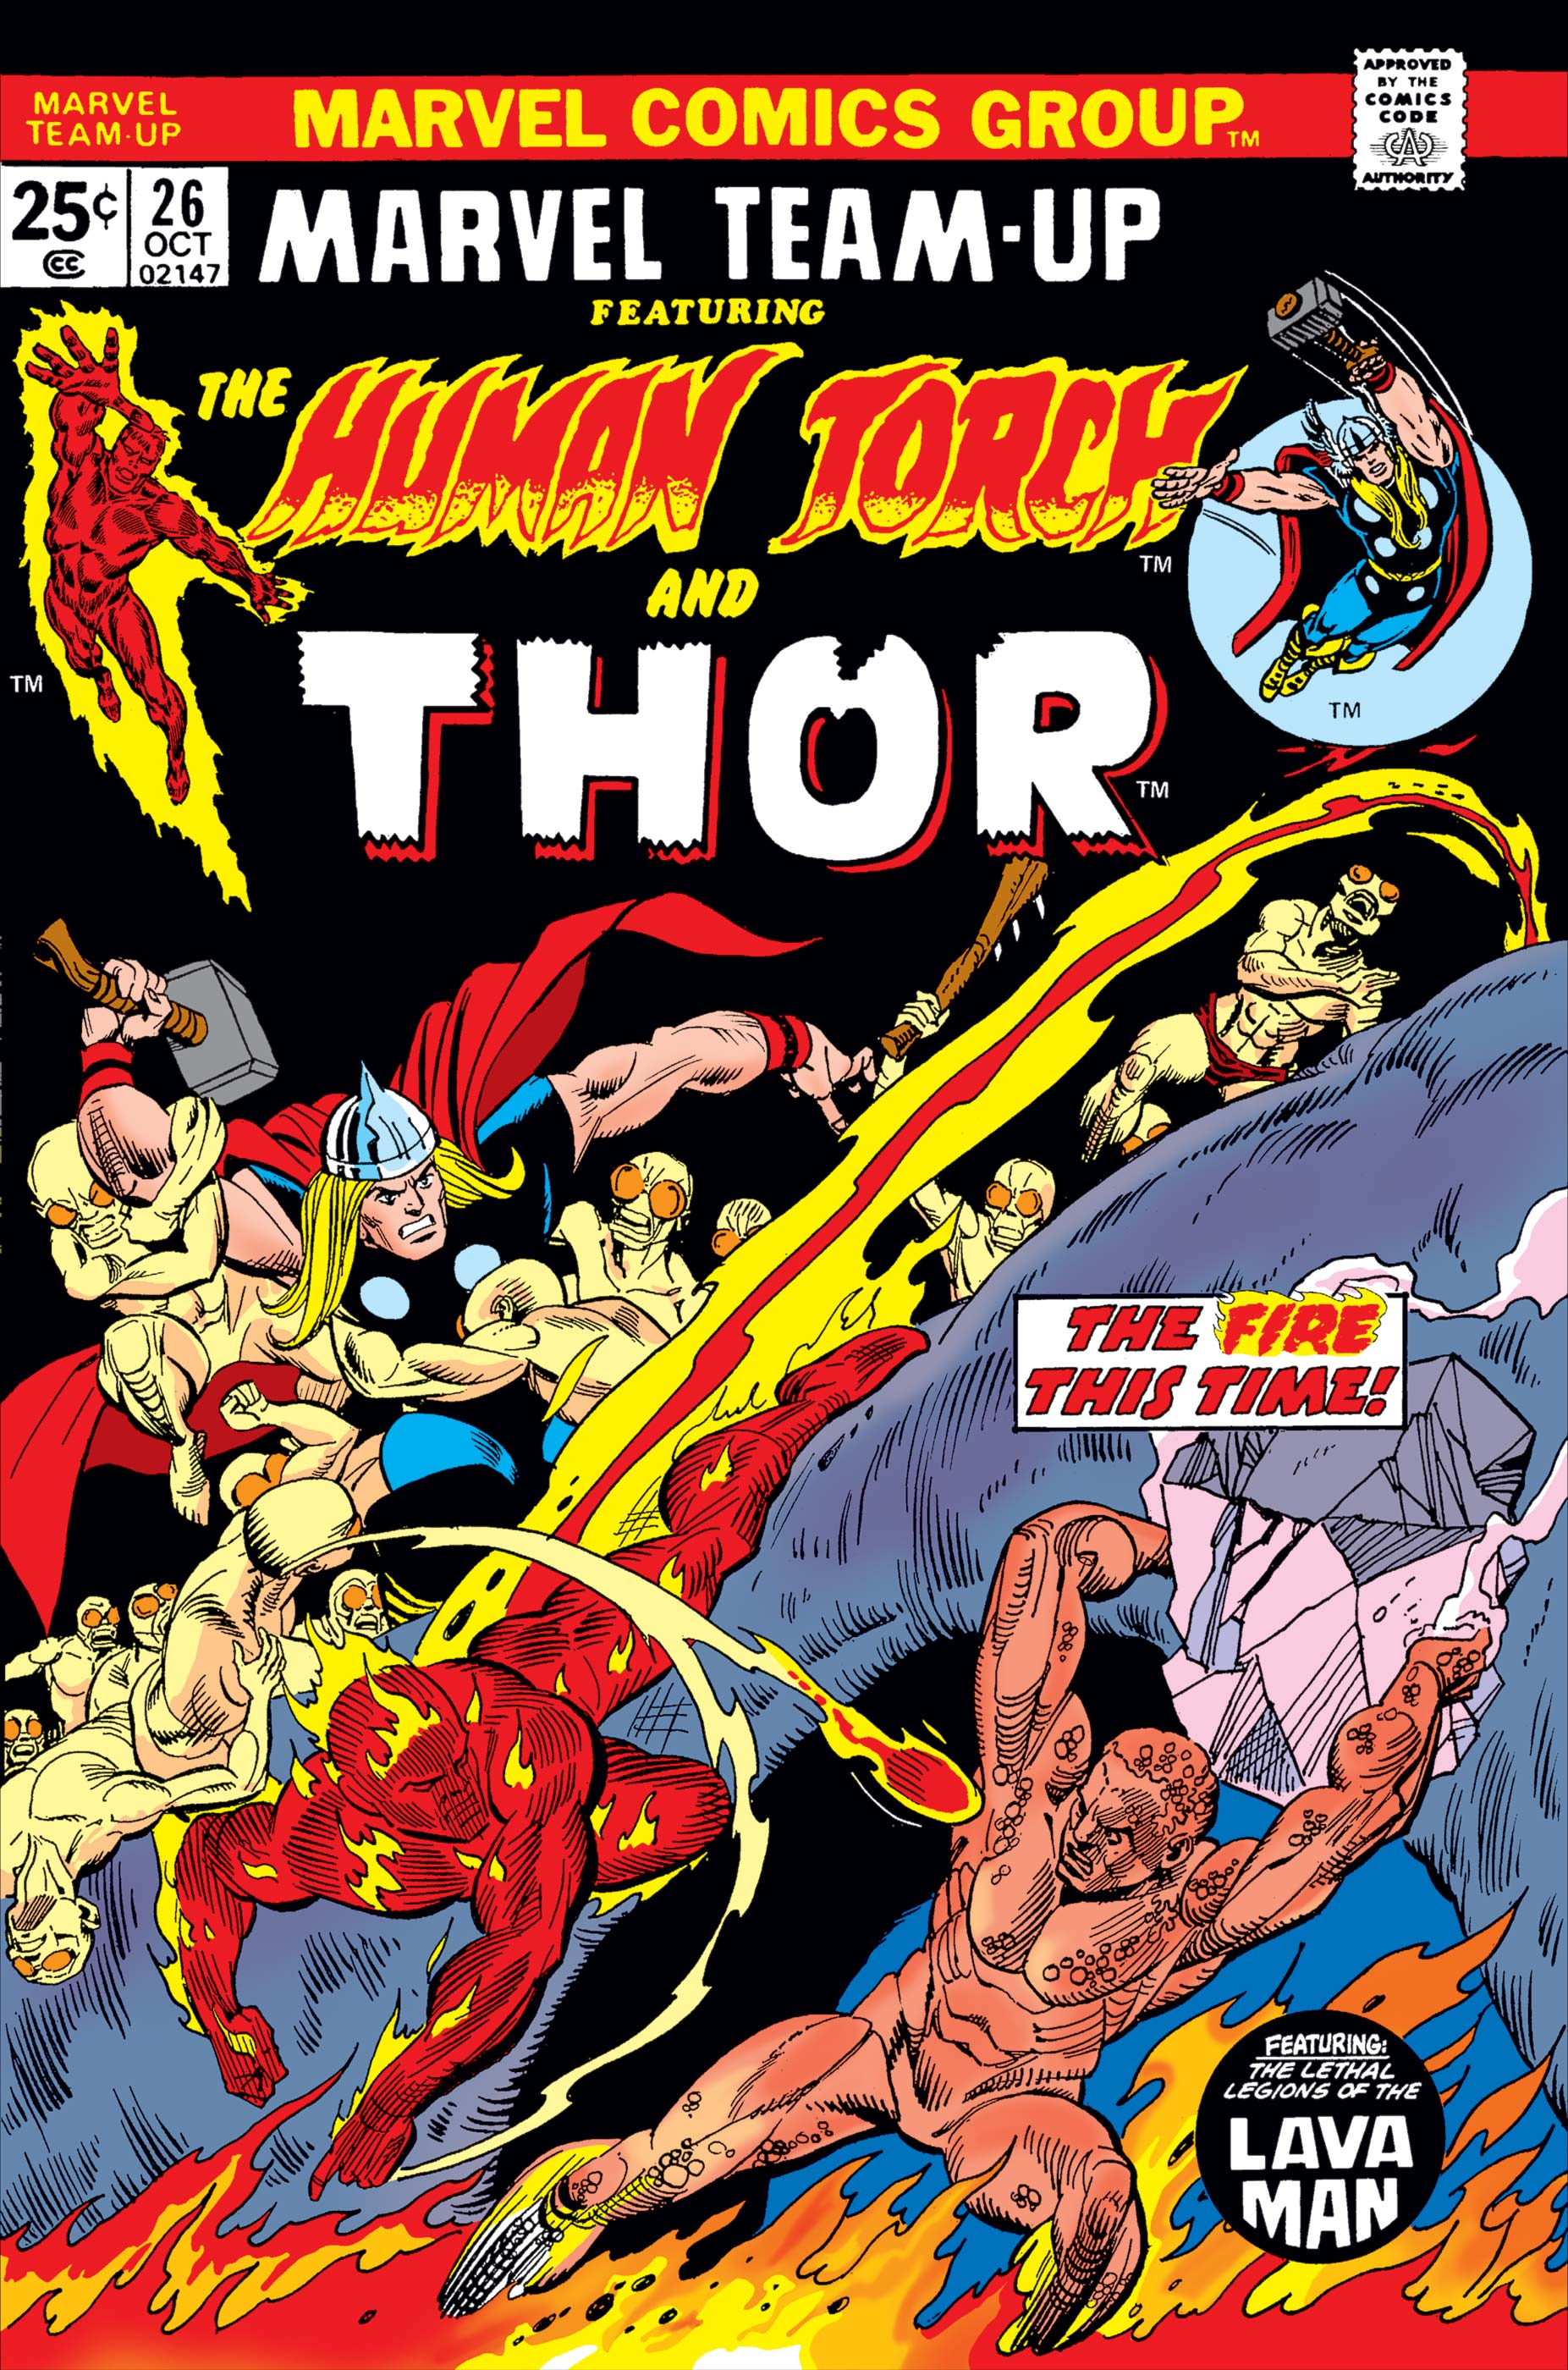 Marvel Team-Up (1972) #26